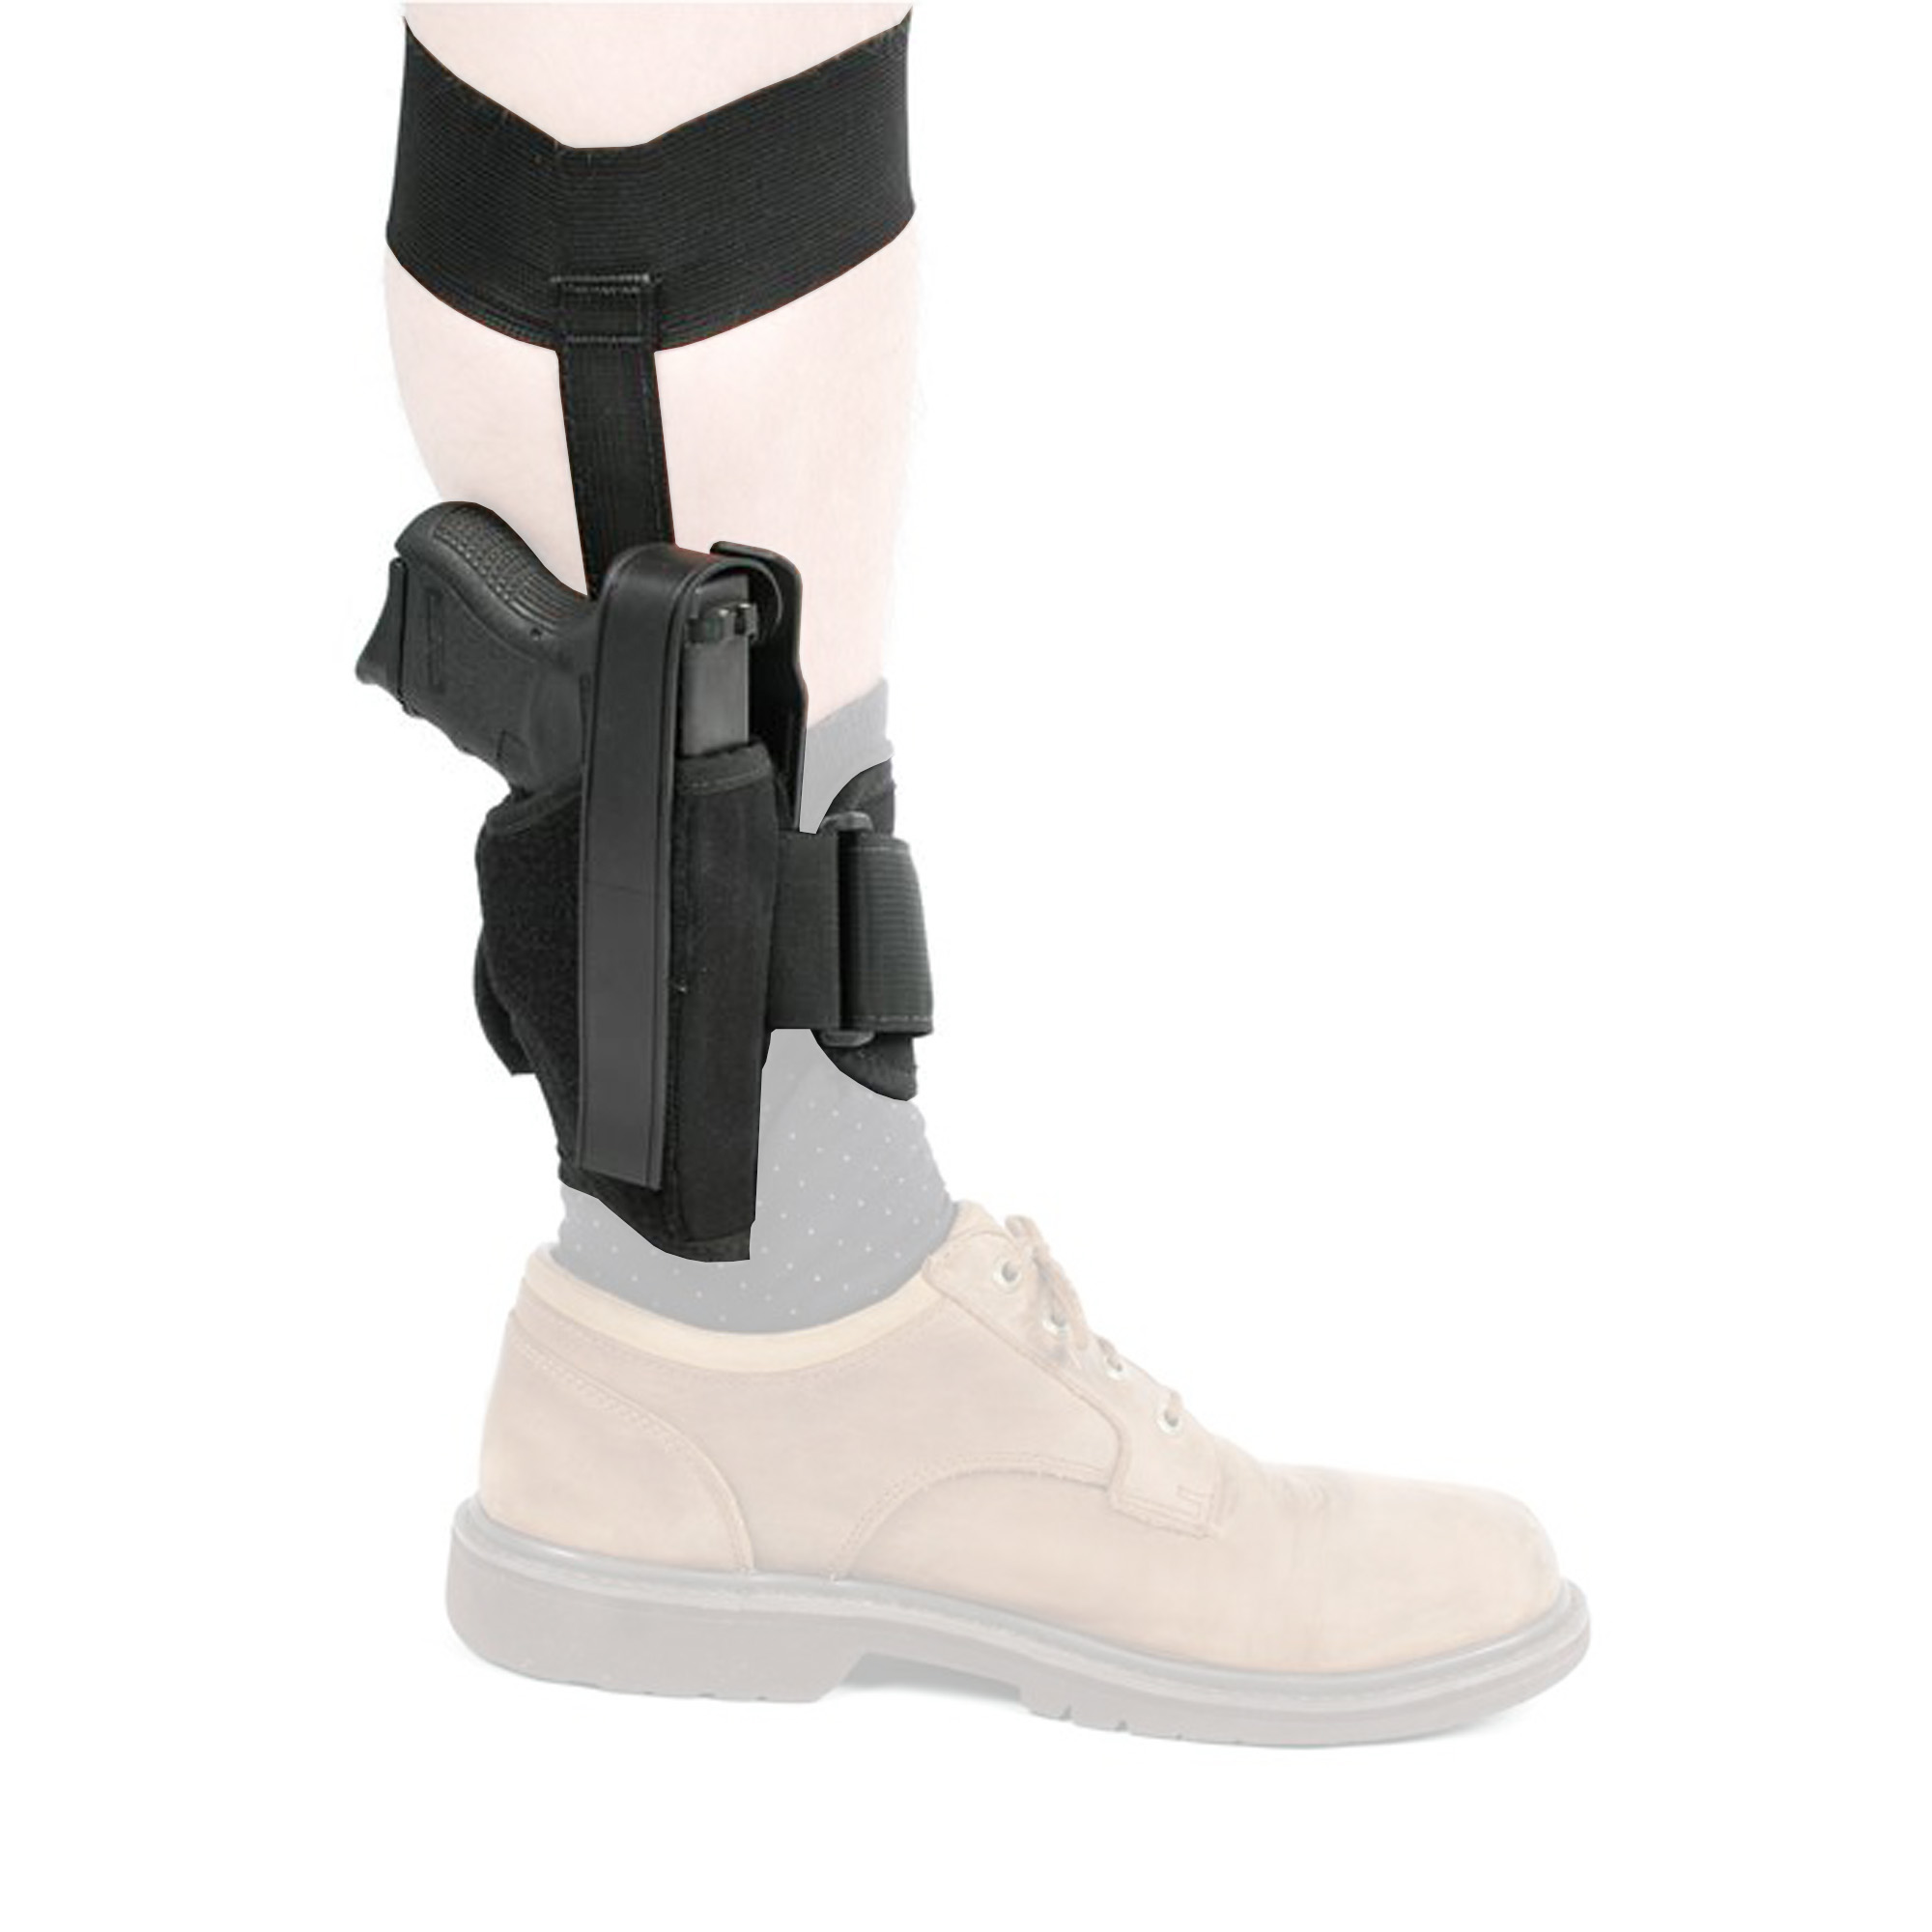 Bh Ankle Hlstr Sz 0 Rh Blk